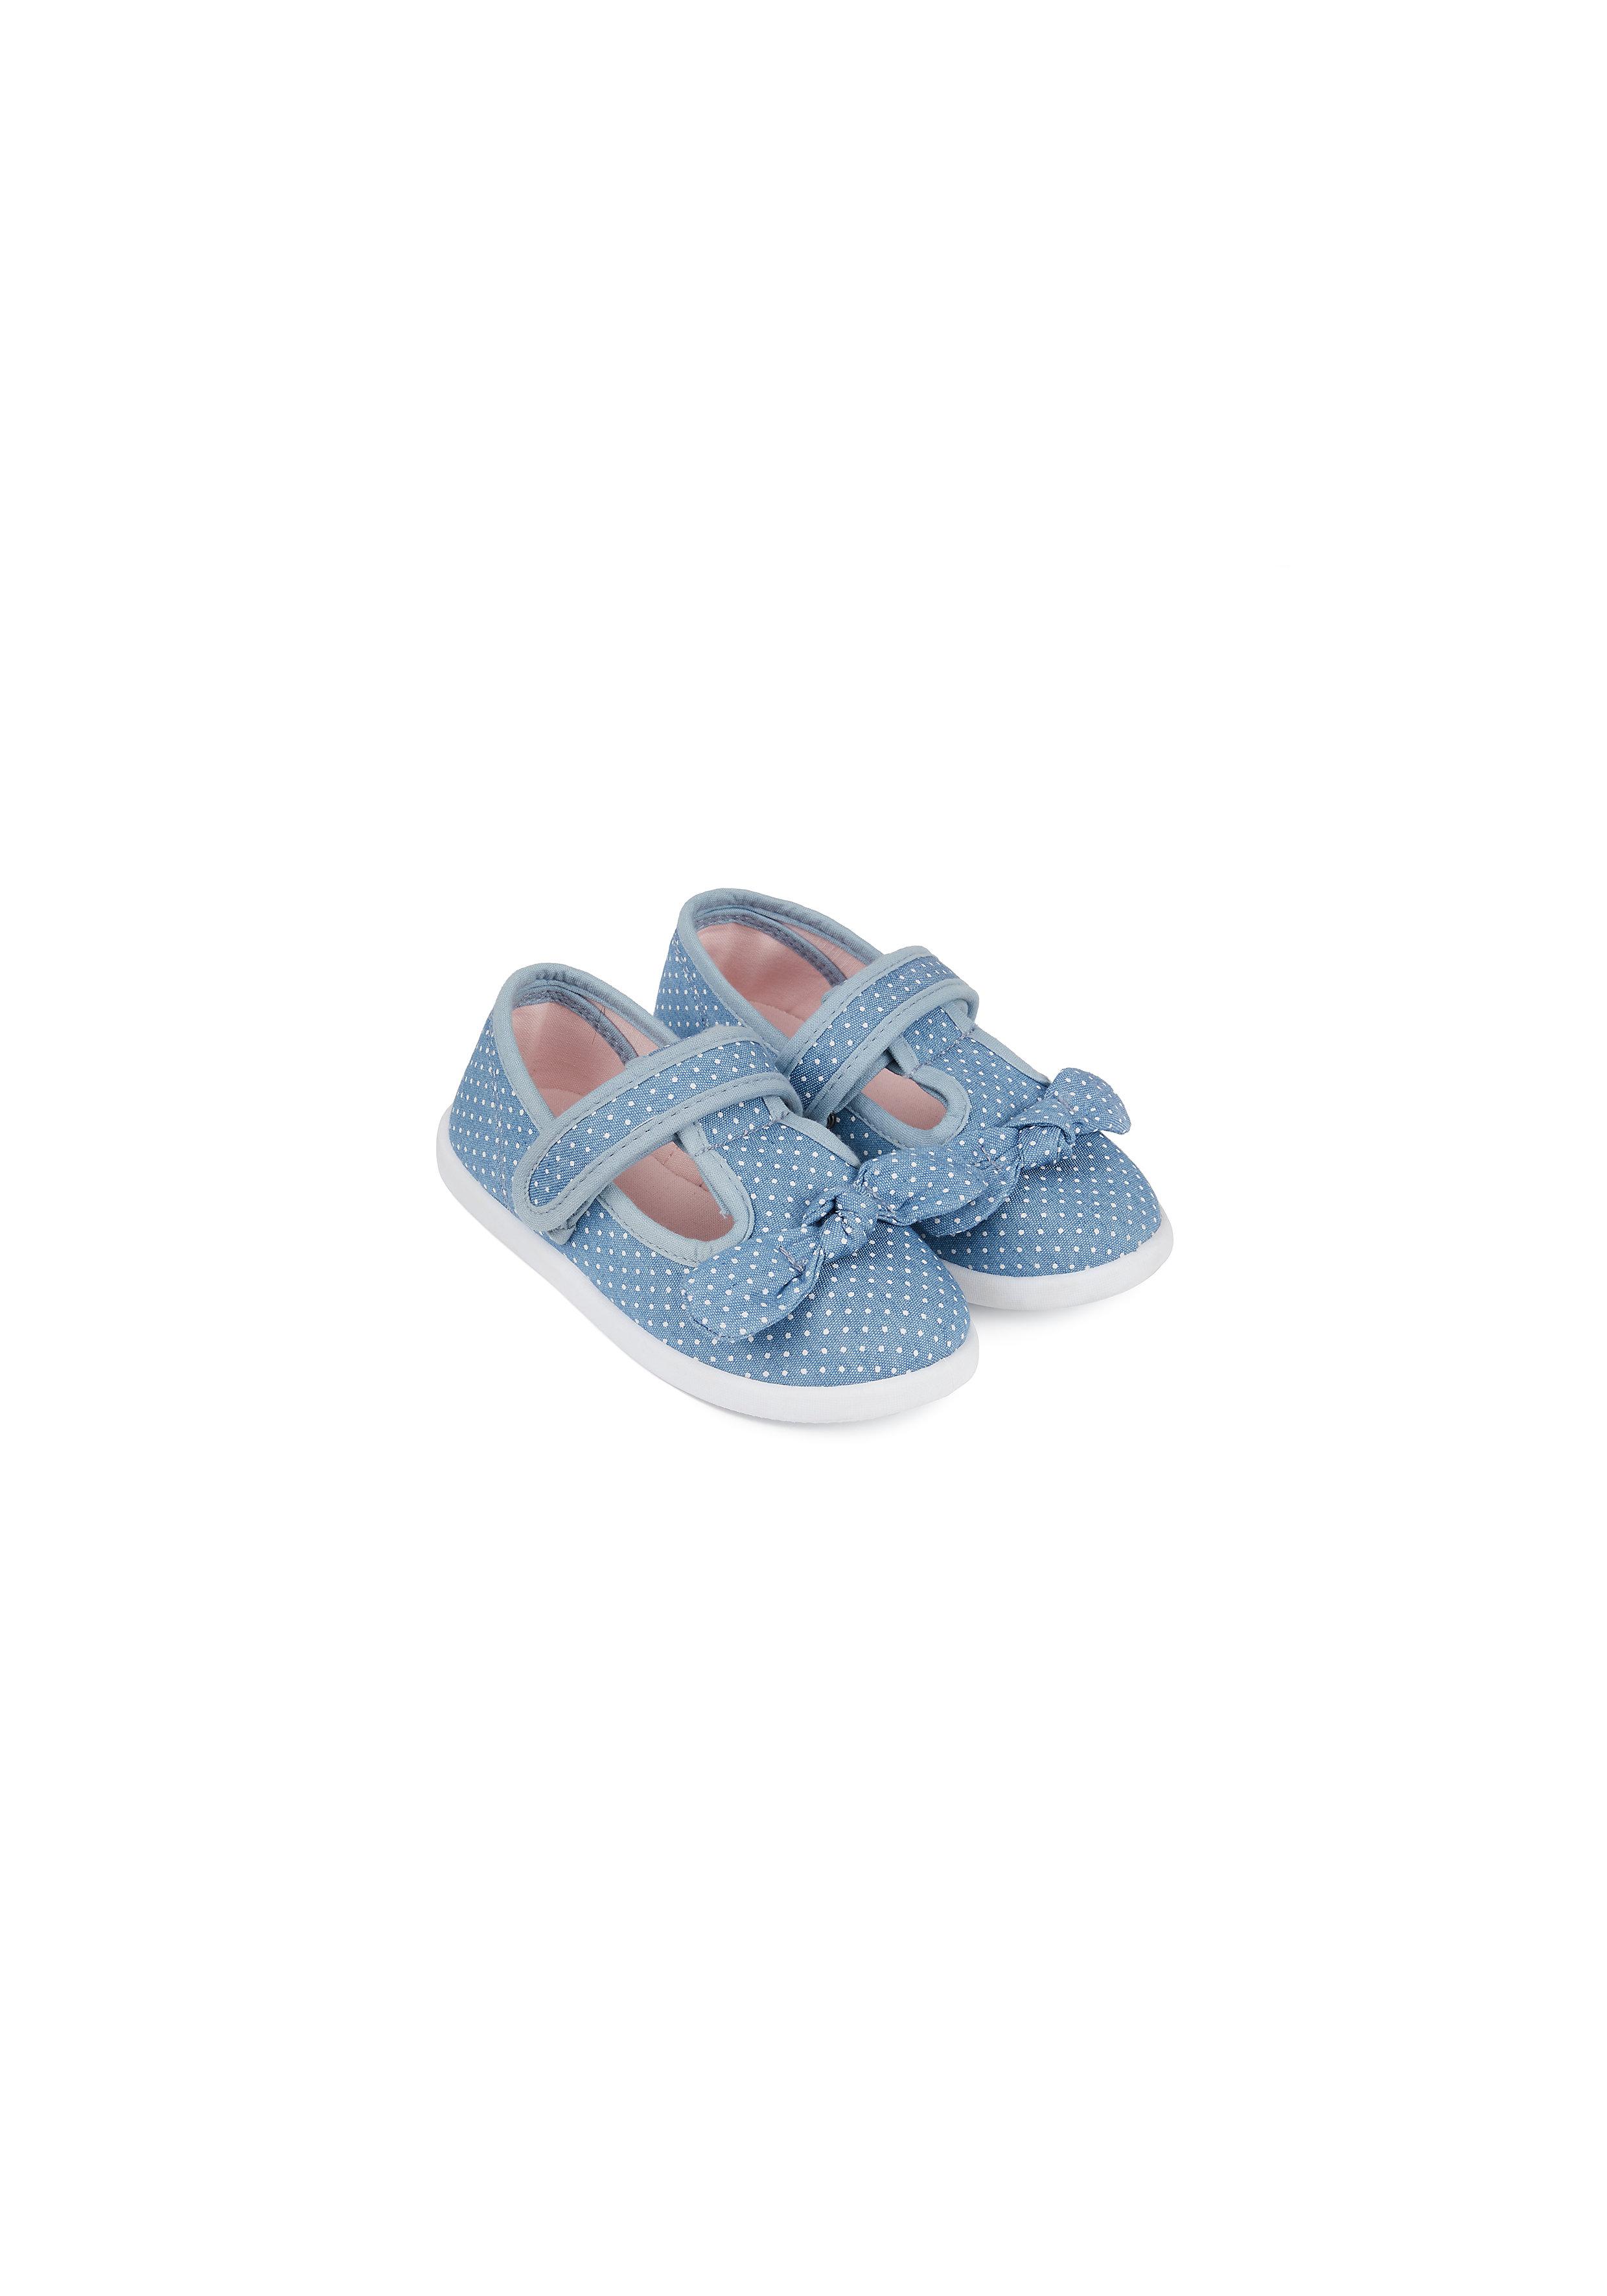 Mothercare | Girls Denim Canvas Shoes